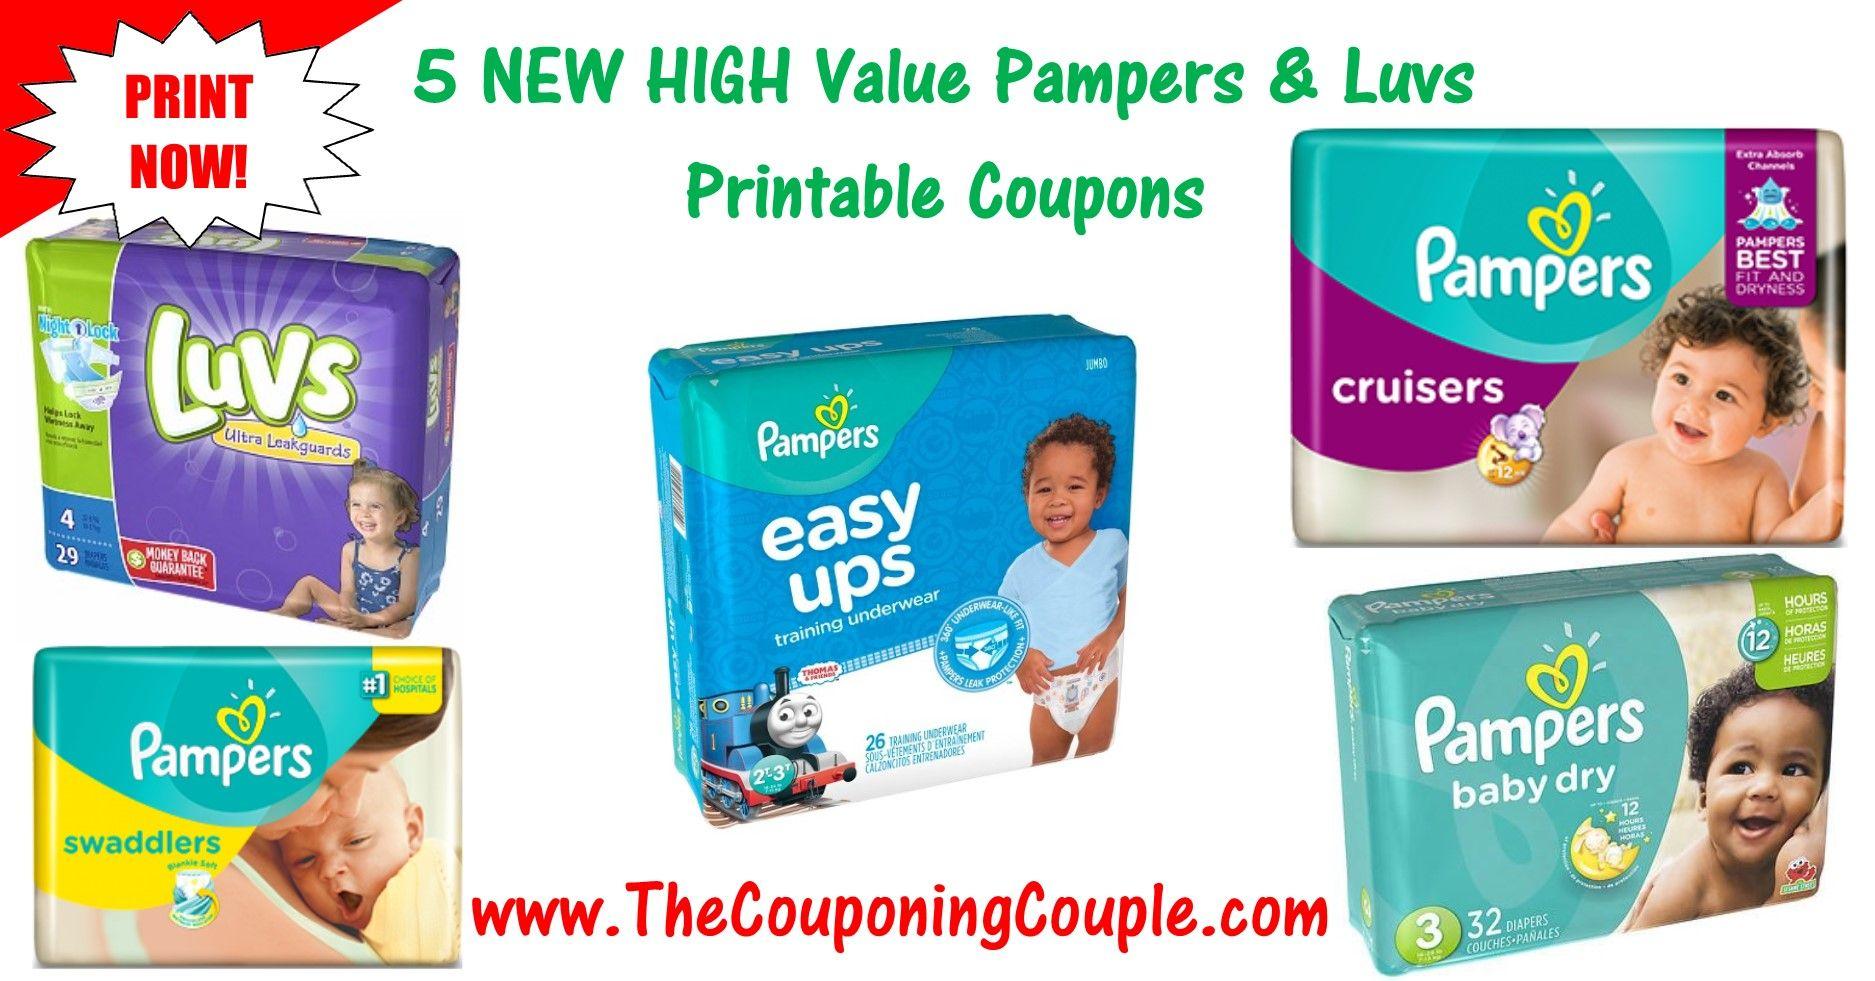 Pampers Printable Coupons  Print NOW  in Savings  Printable